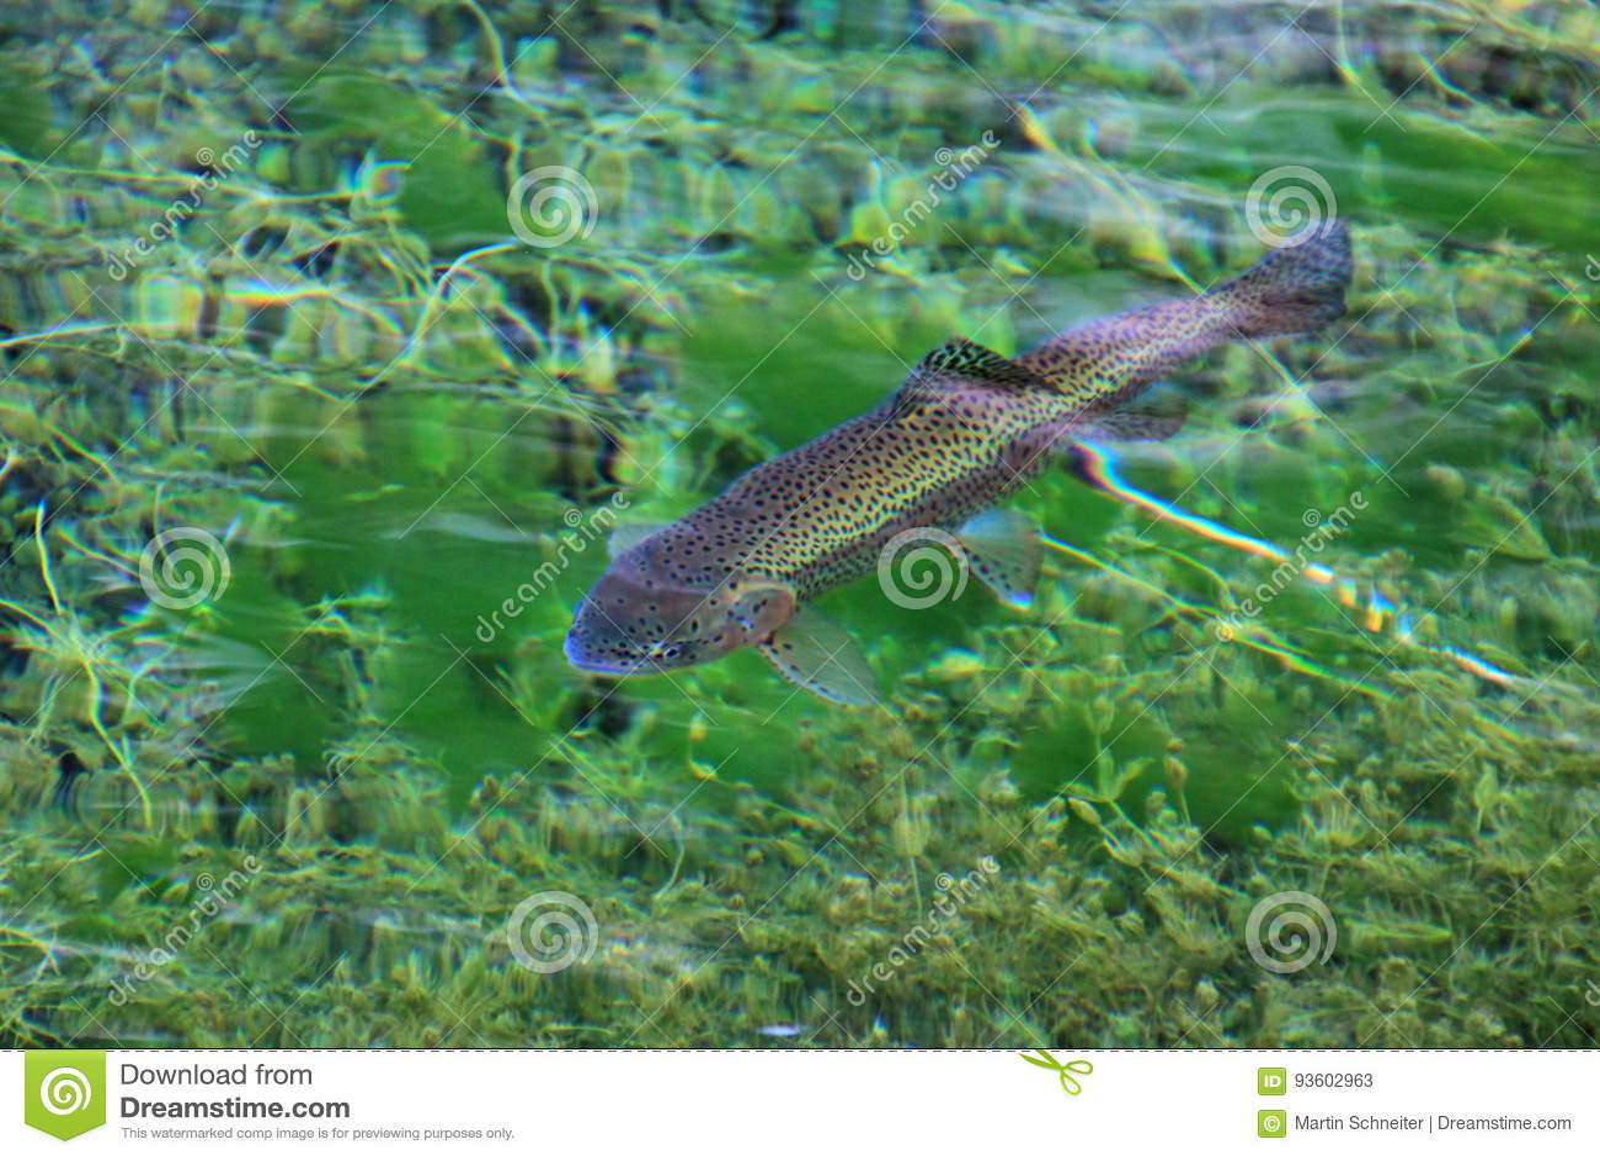 Truta Arco-íris Na água Do Lago Claro Laguna Nina Encantada